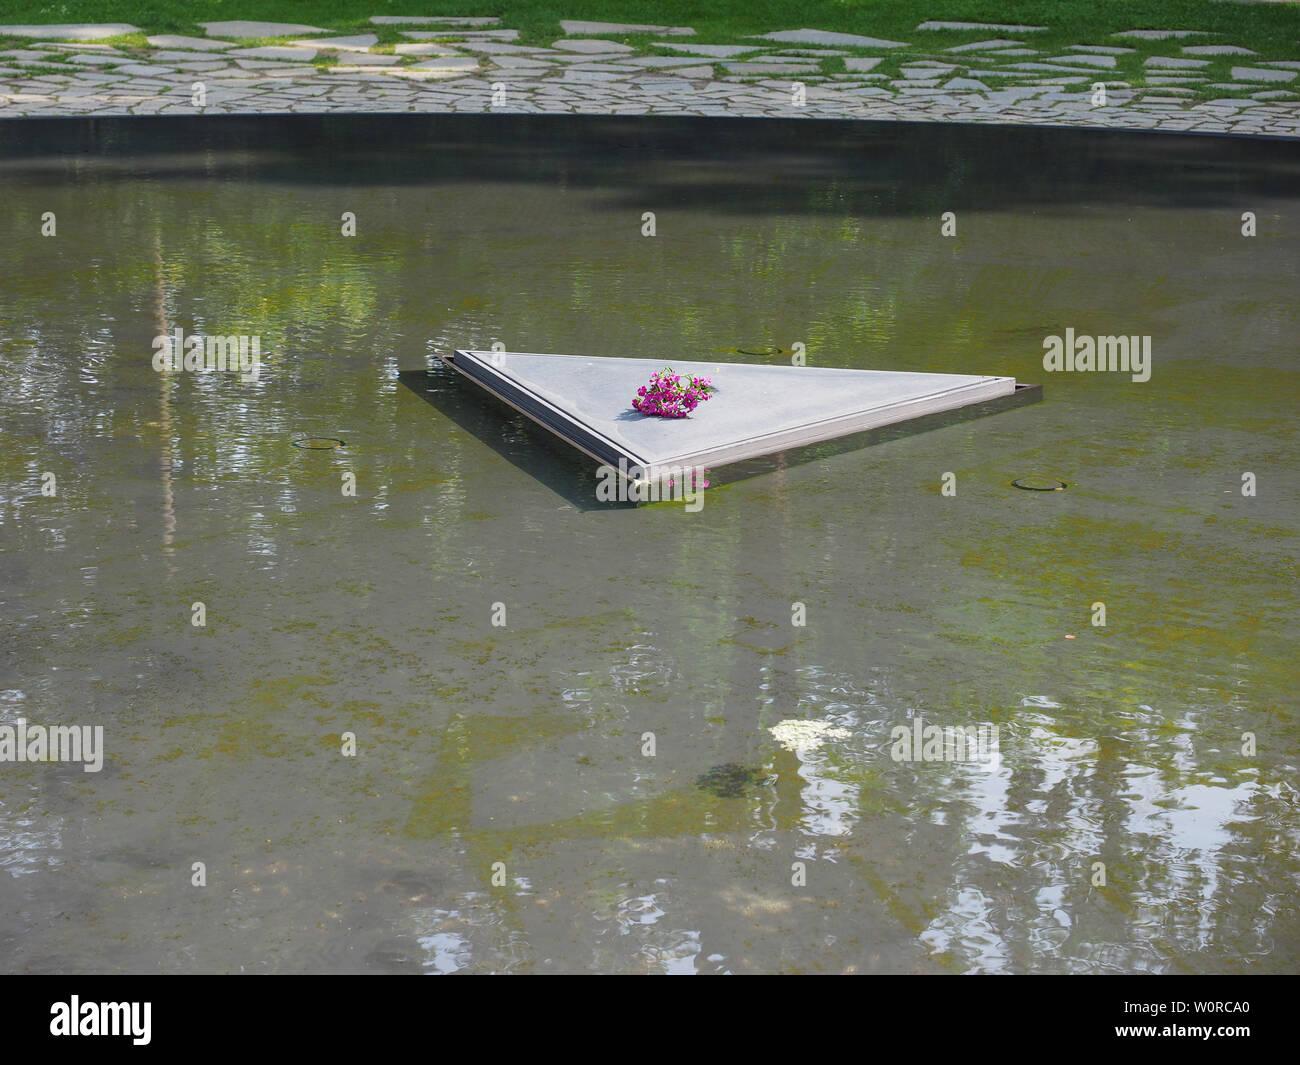 BERLIN, GERMANY - CIRCA JUNE 2019: Denkmal fuer die im Nationalsozialismus ermordeten Sinti und Roma Europas (Memorial to the Sinti and Roma of Europe Stock Photo